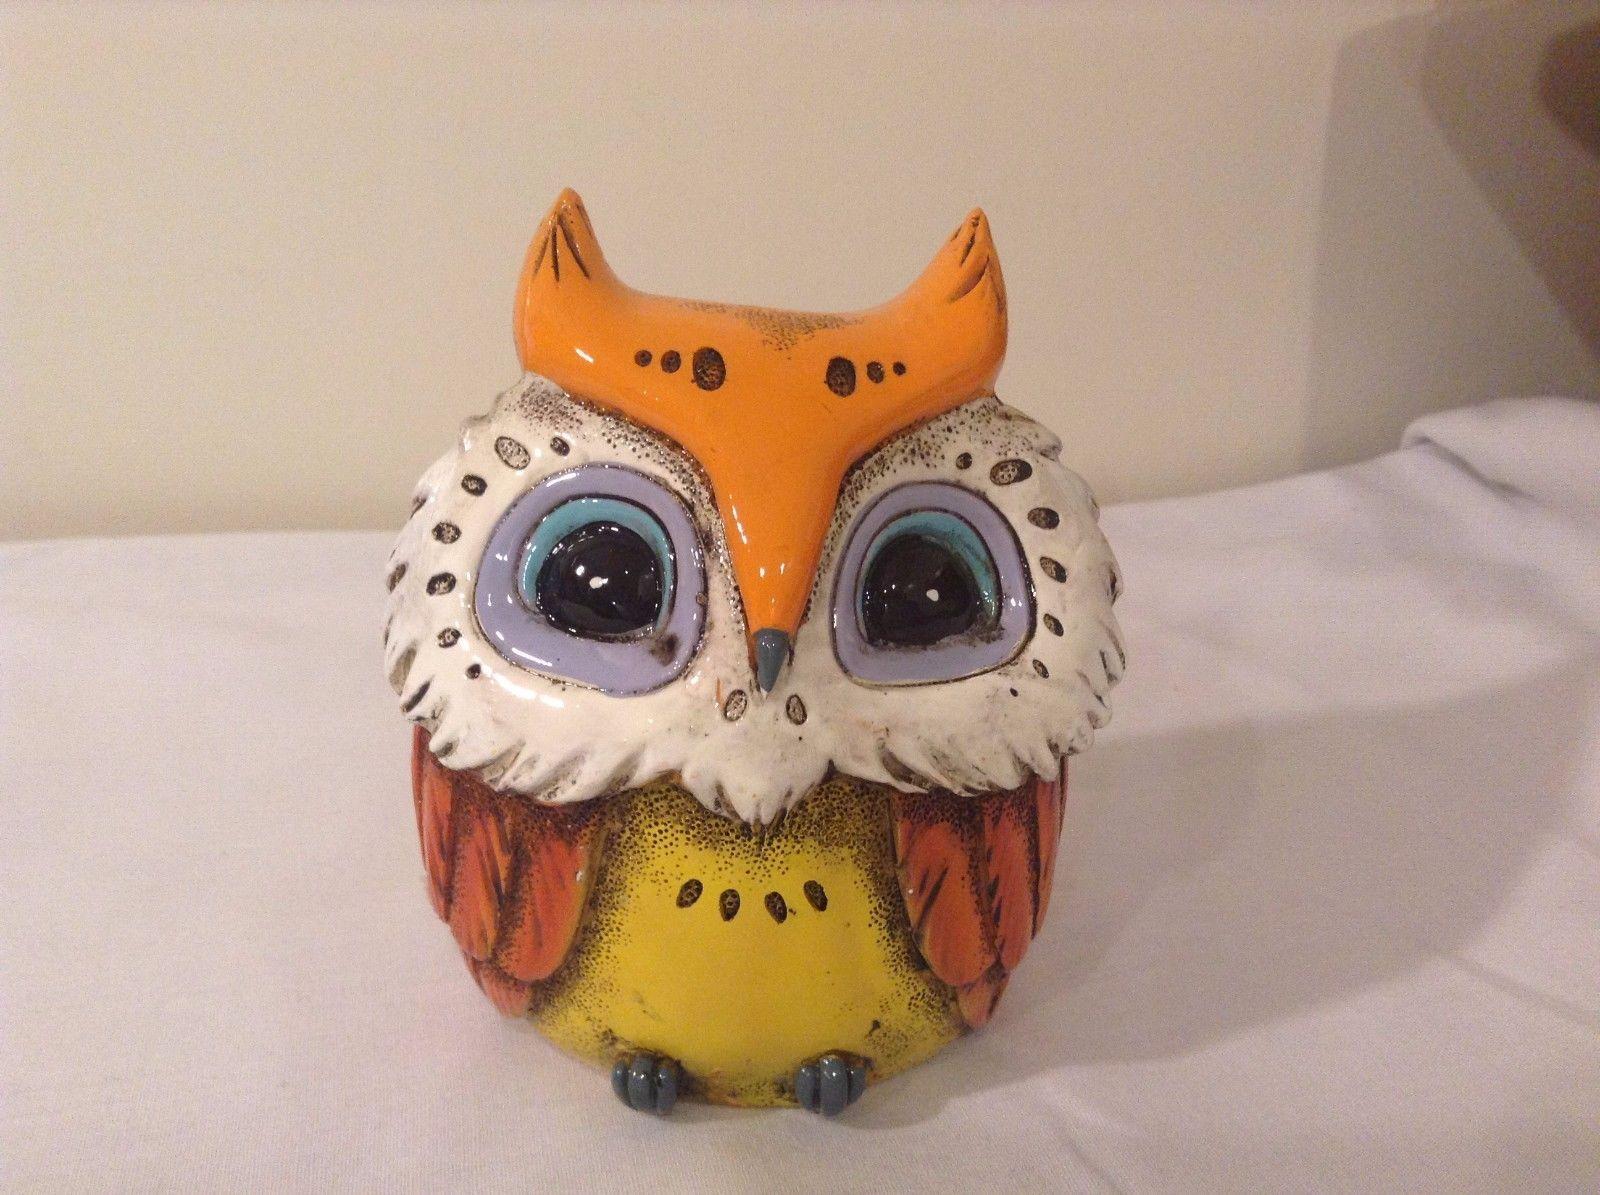 Orange Piggy Bank Owl New Original Packaging